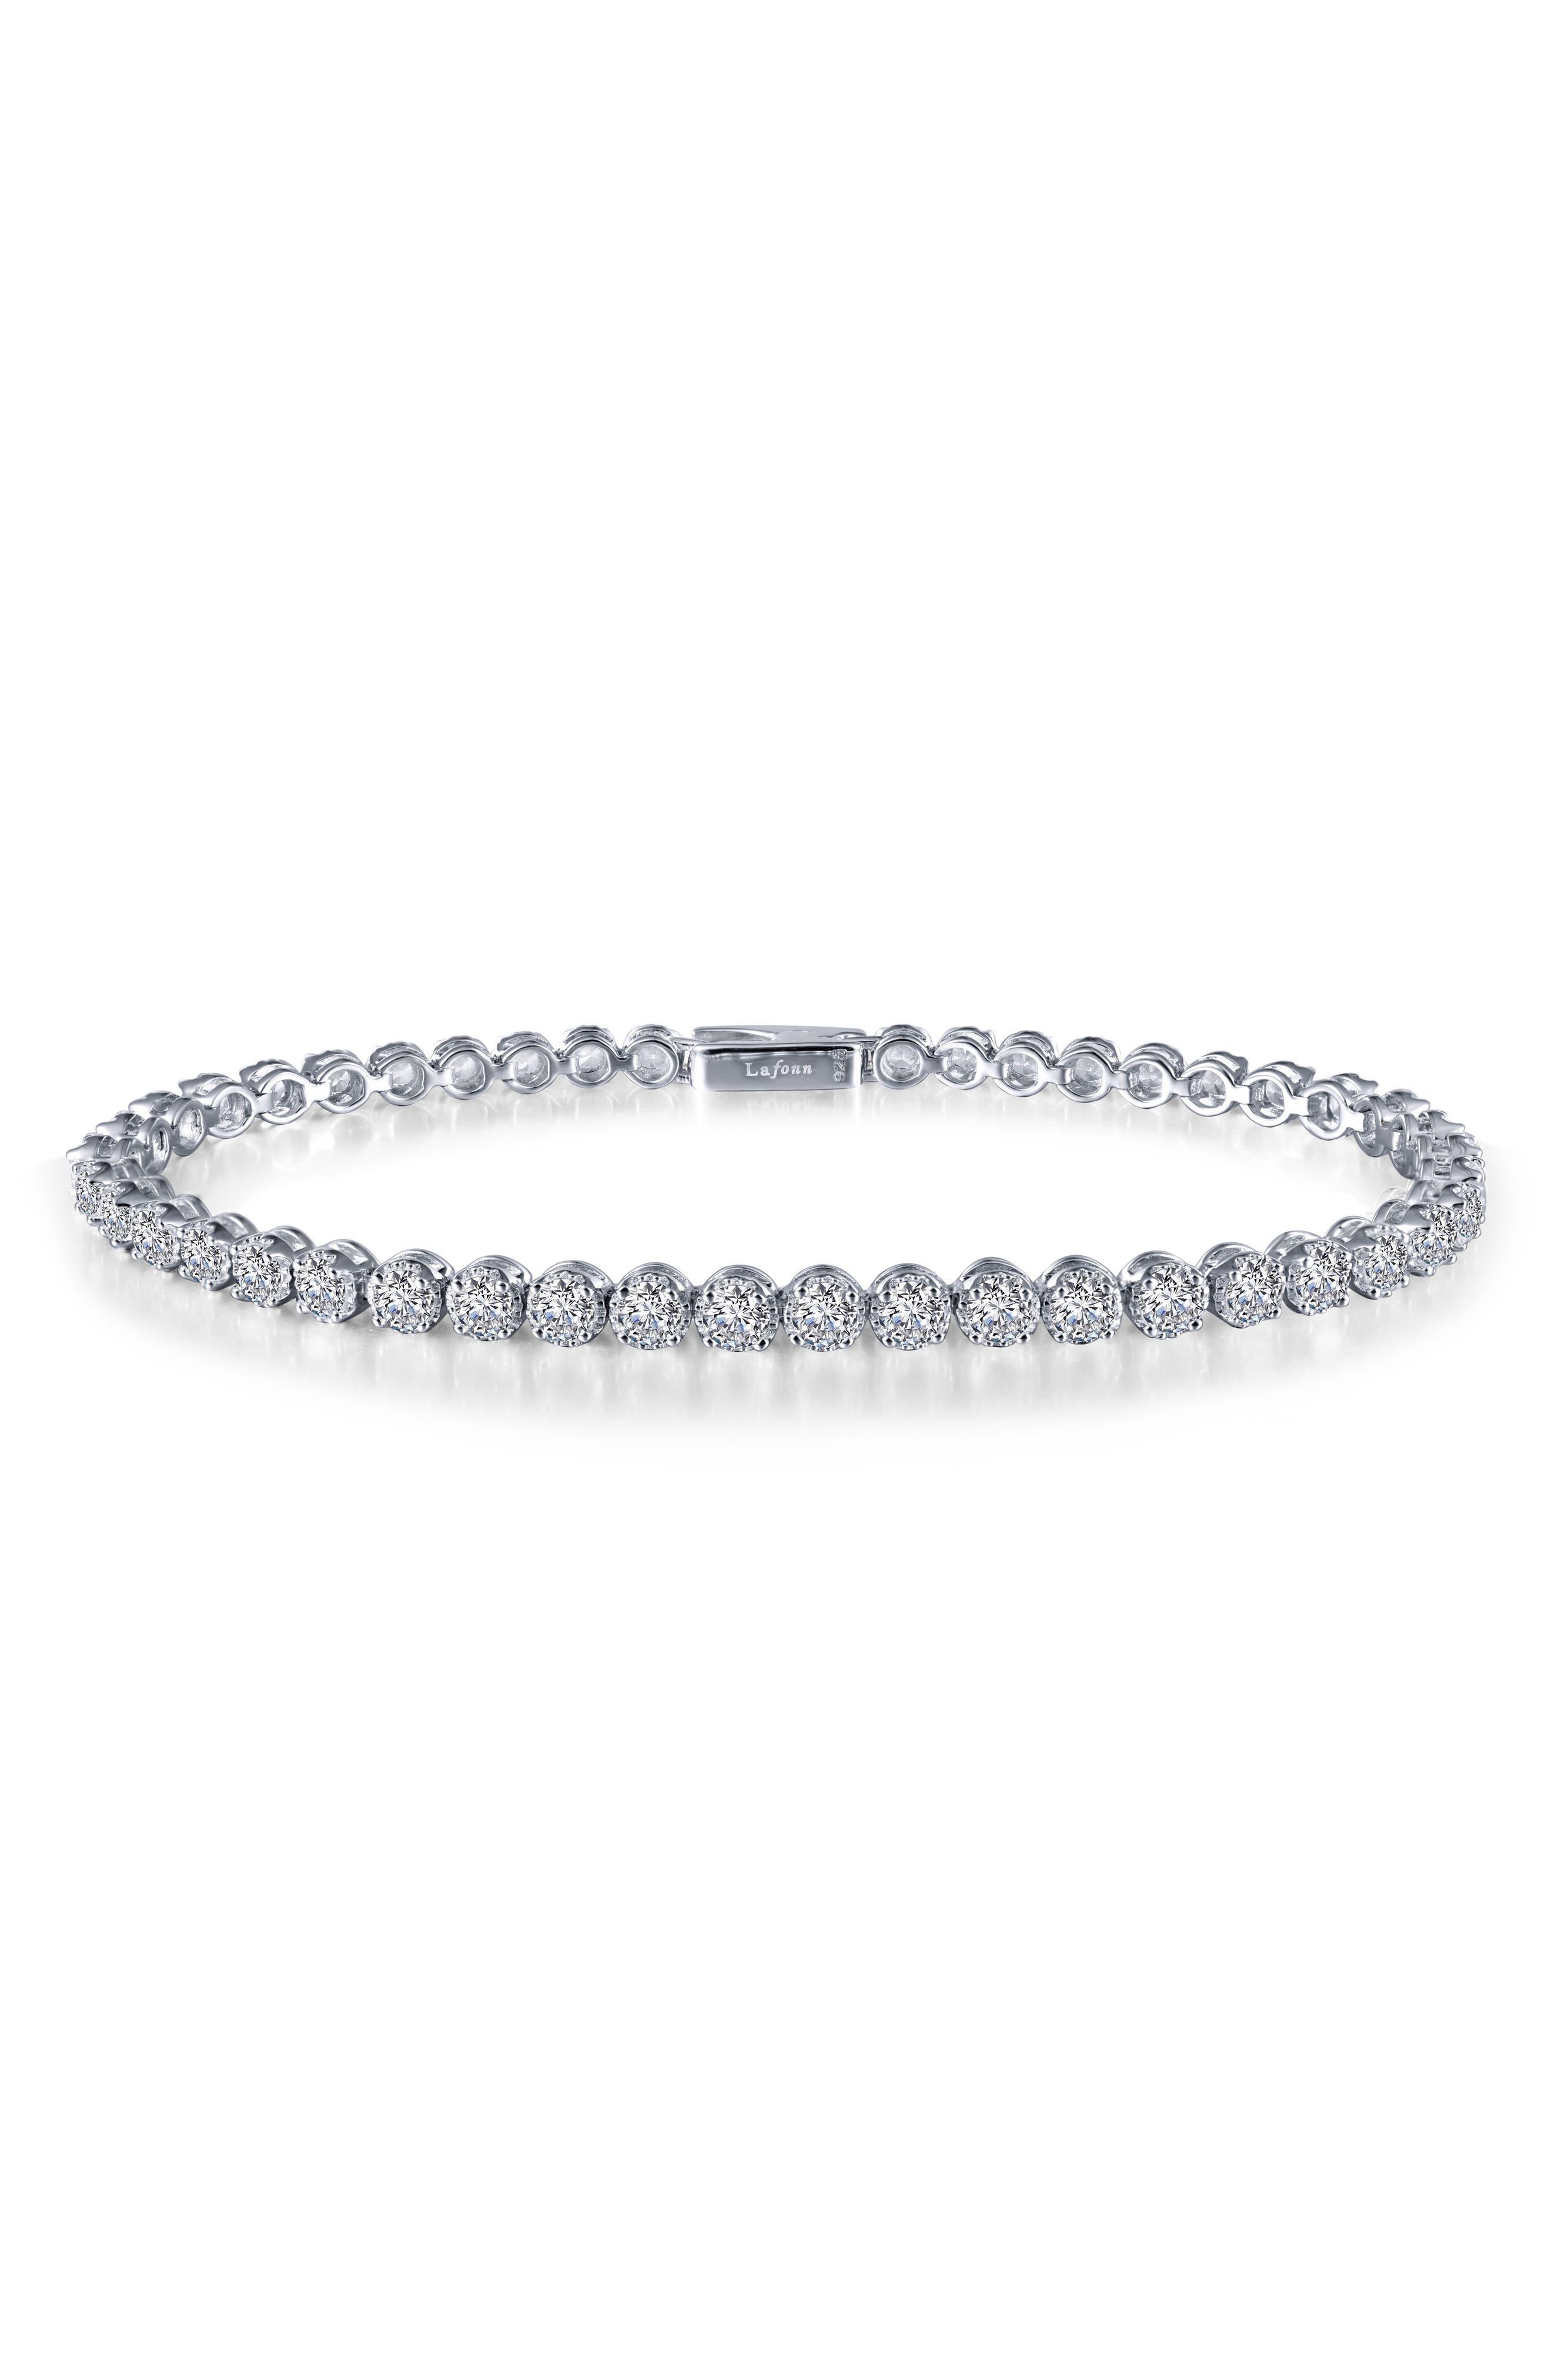 Main Image - Lafonn Simulated Diamond Tennis Bracelet